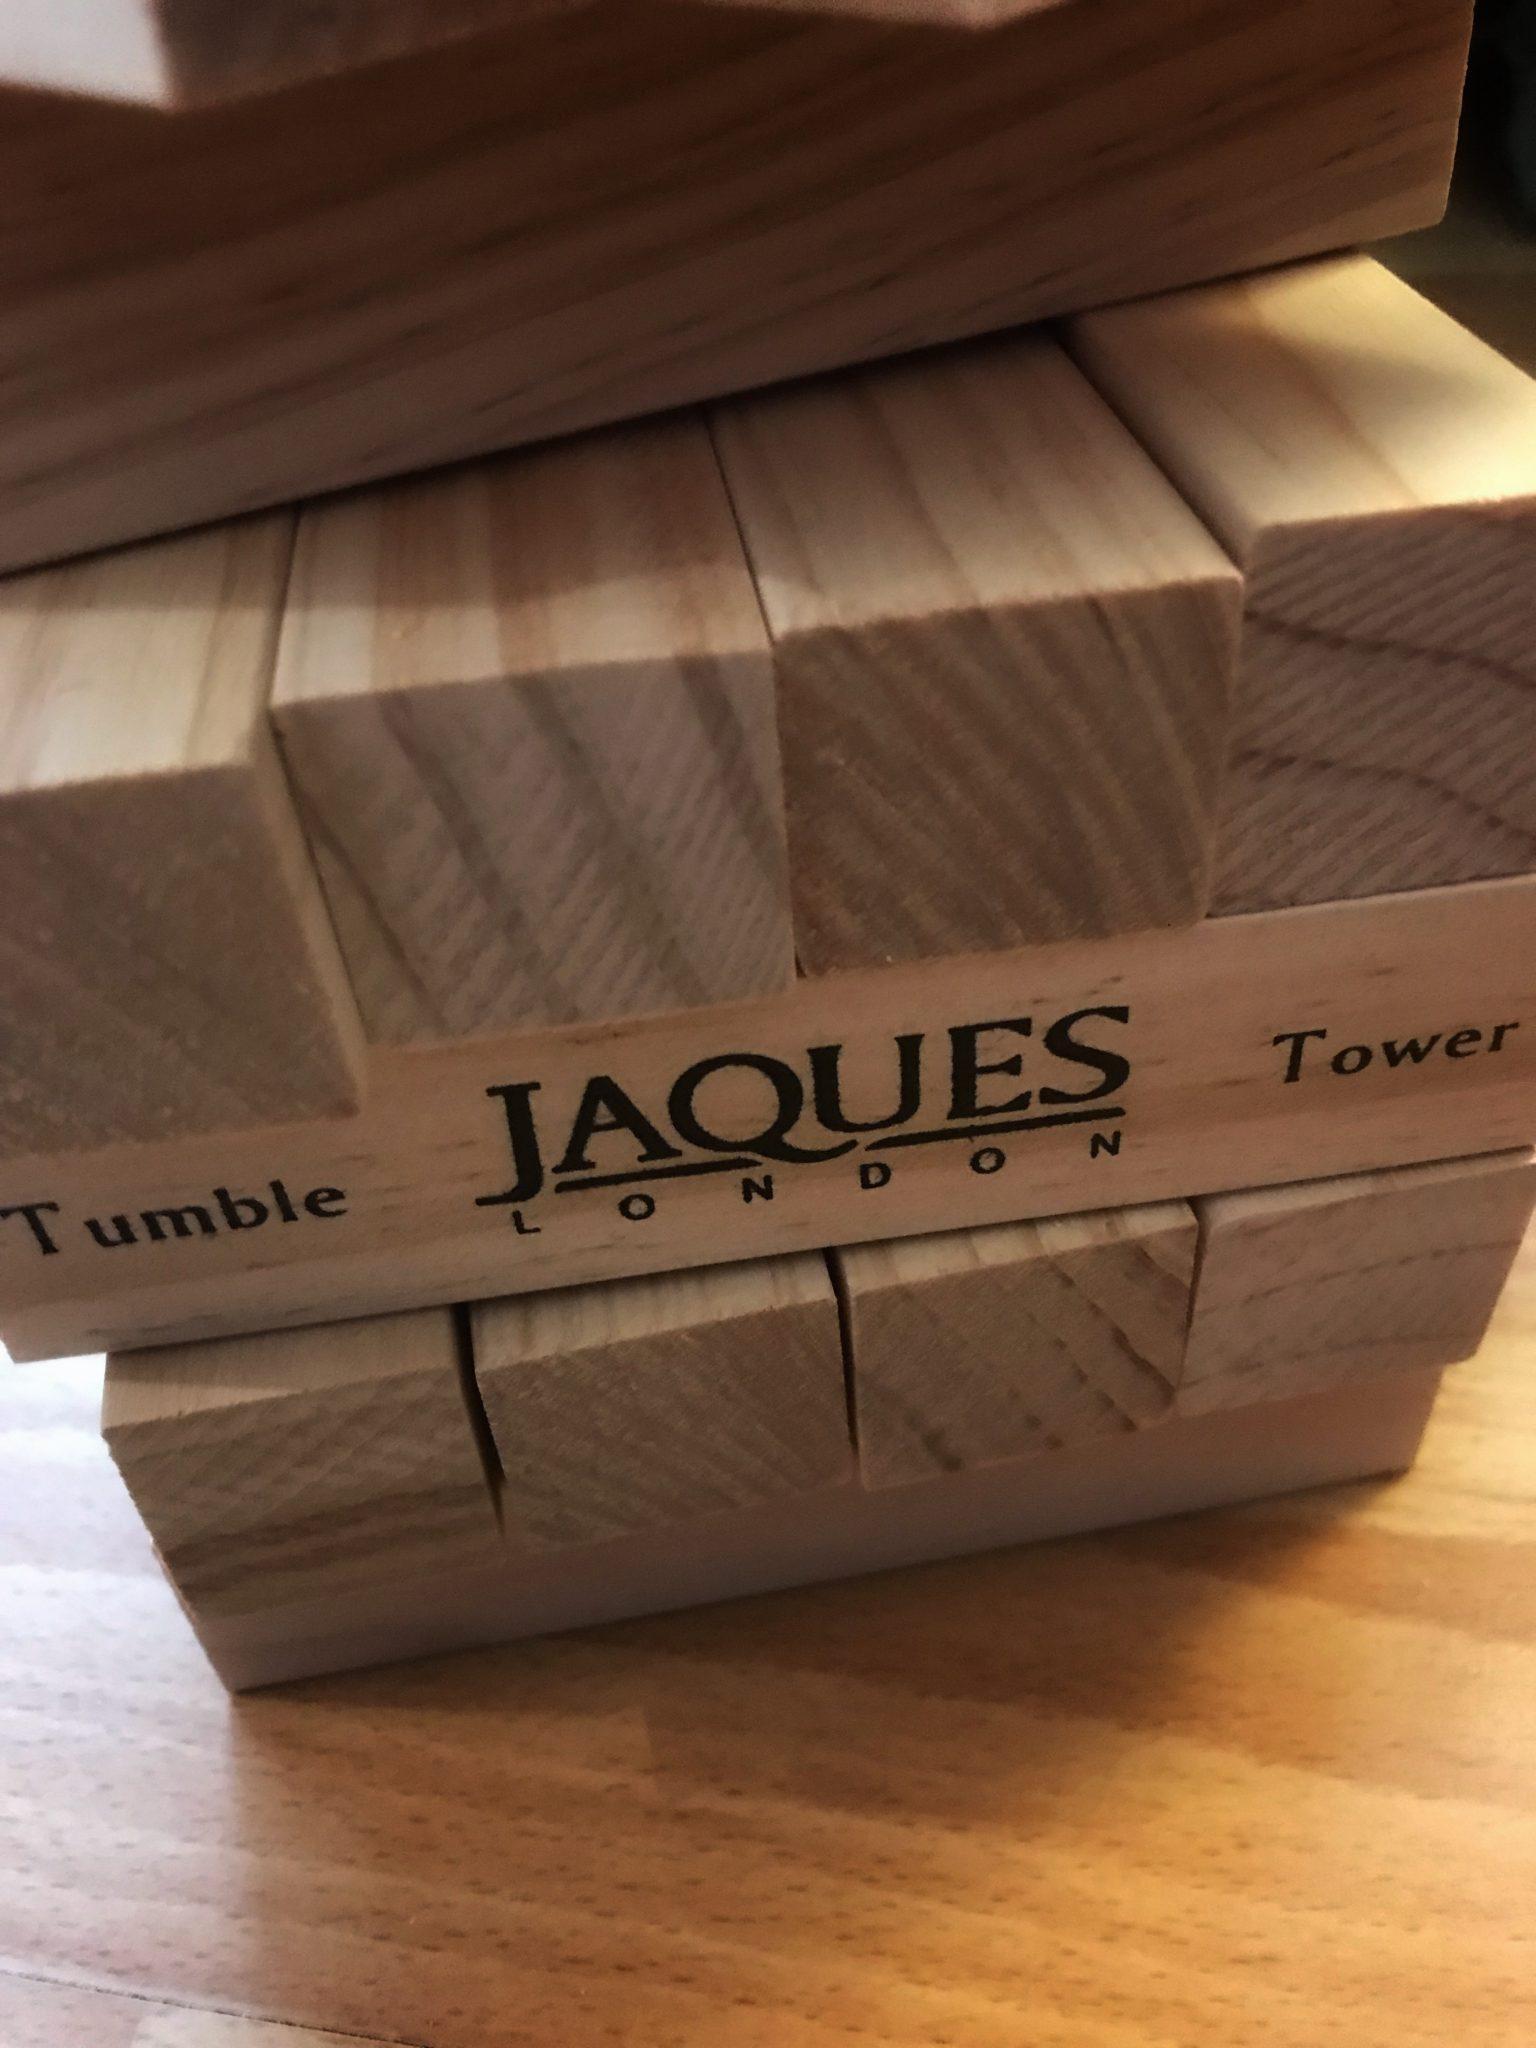 Family Games Night and Tumble Tower Giveaway at https://lukeosaurusandme.co.uk